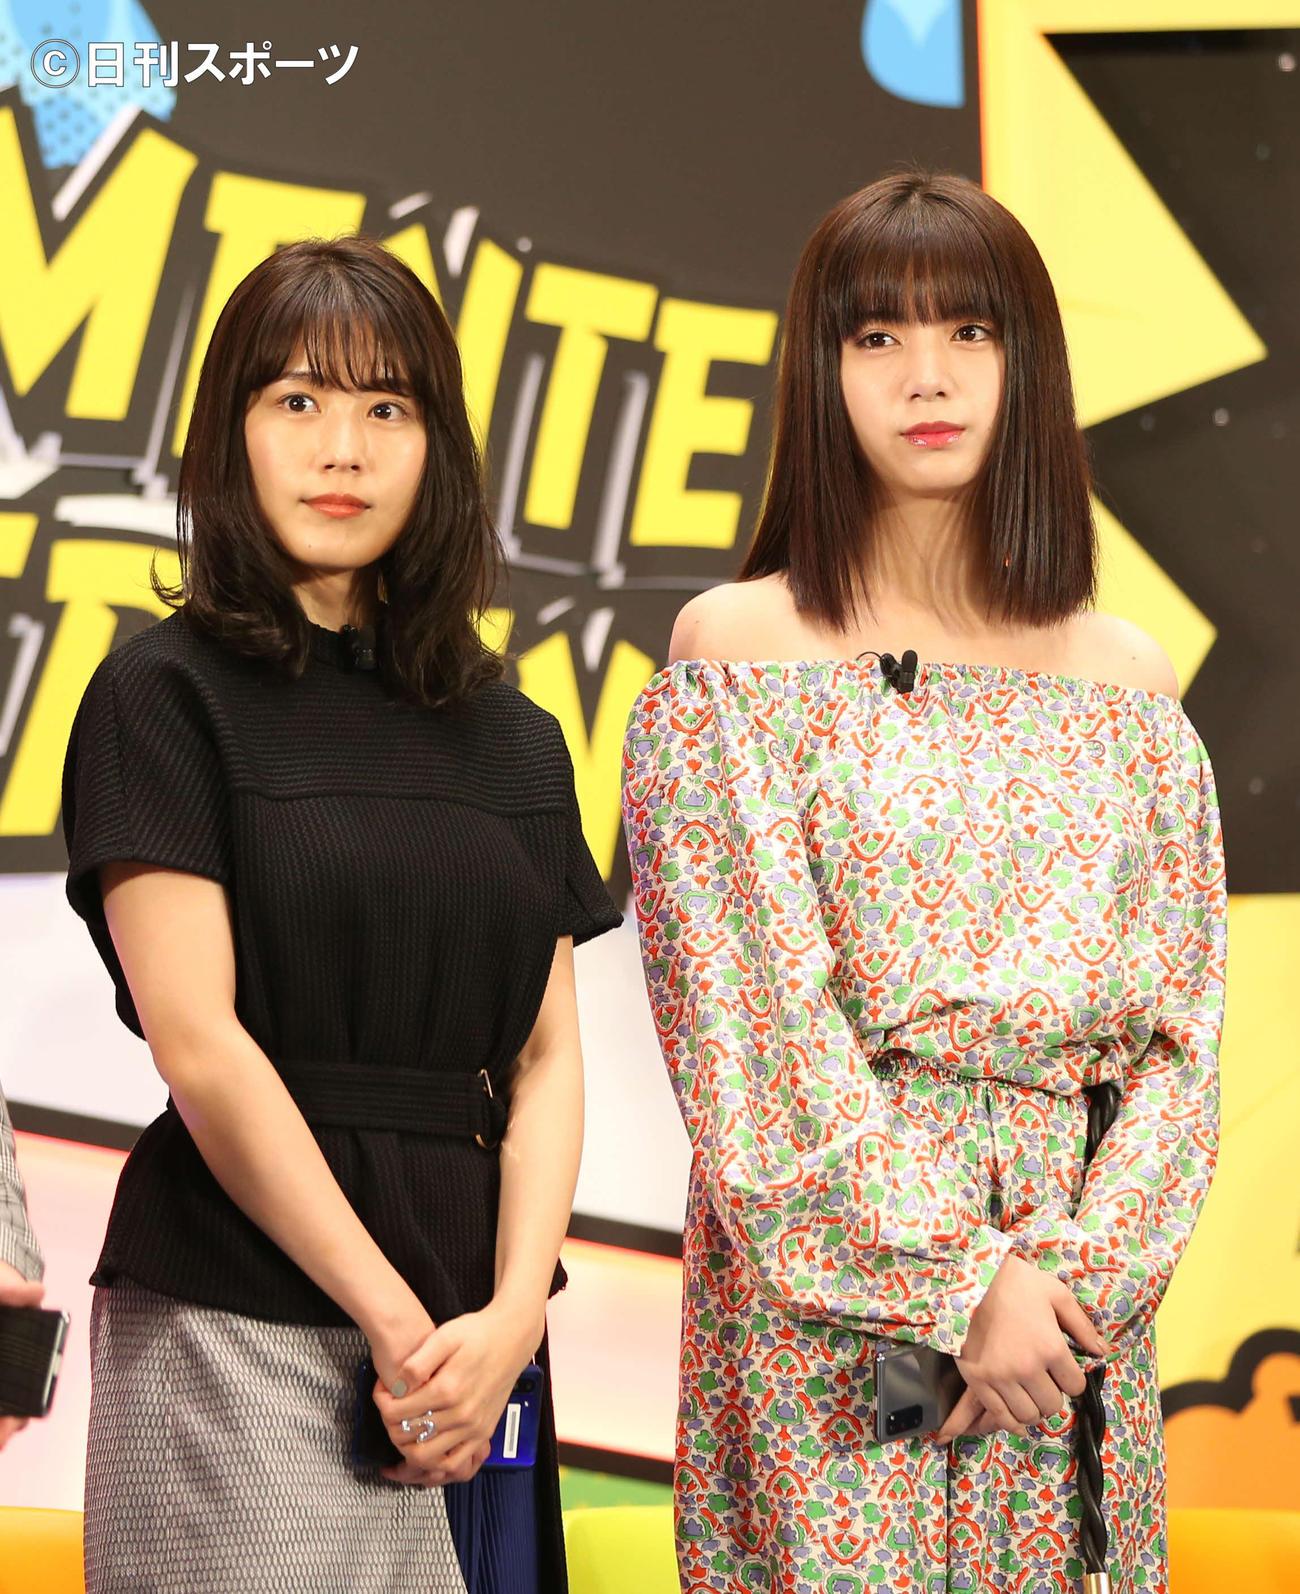 「UNLIMITED WORLD au 5G」のトークセッションを行った有村架純(左)、池田エライザ